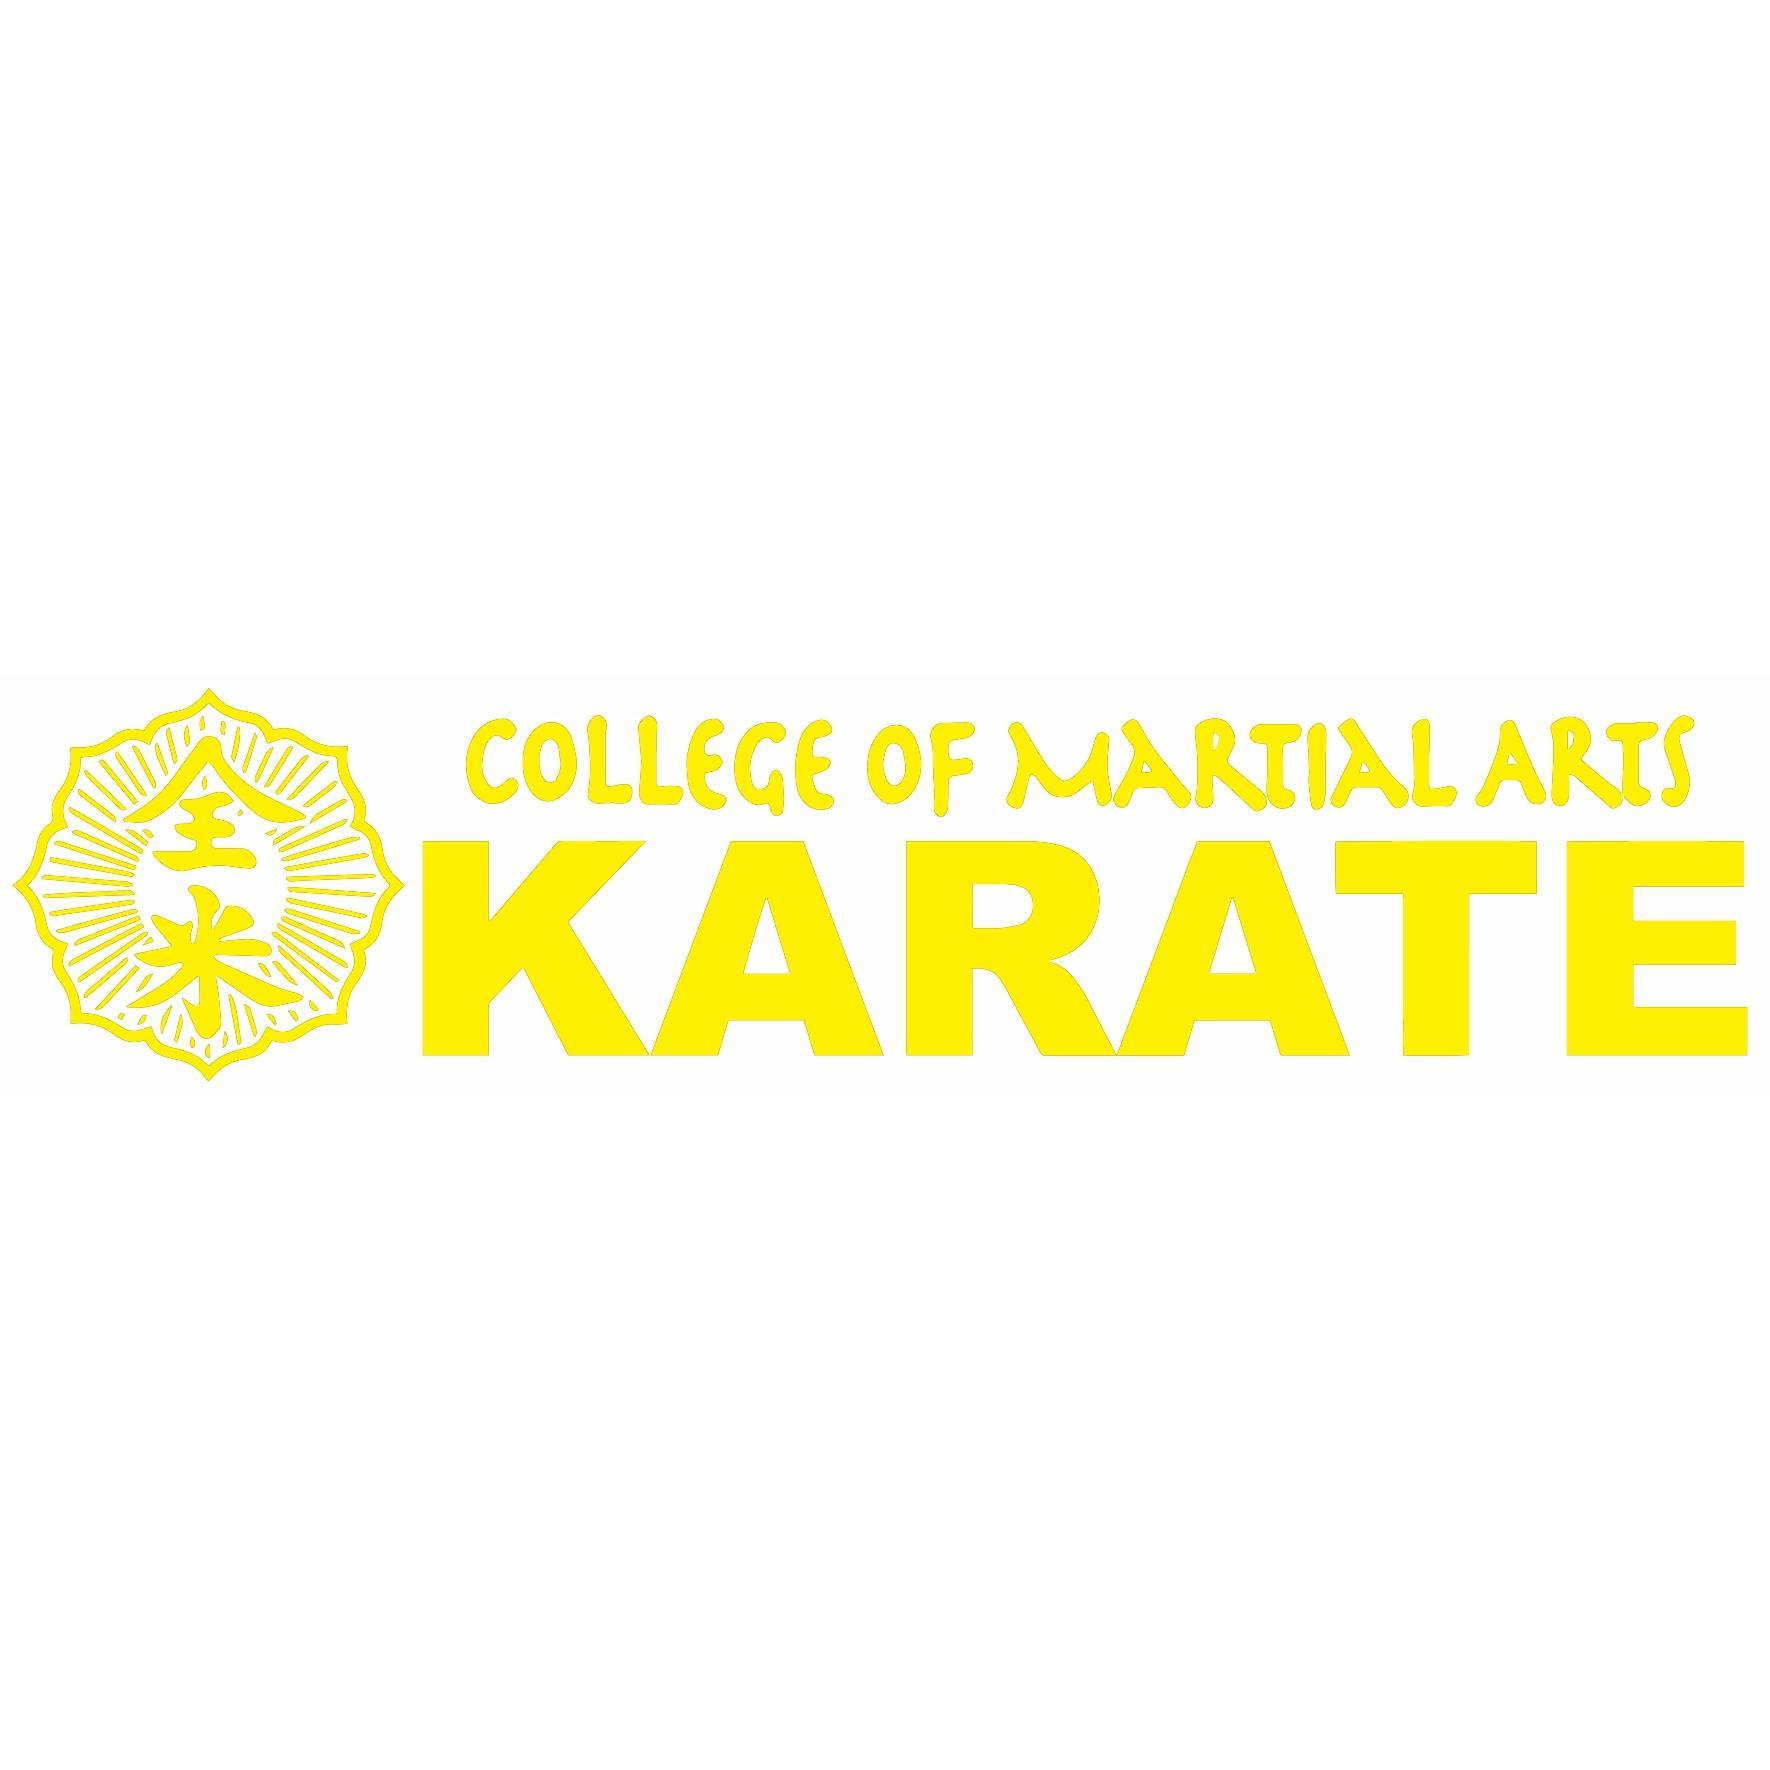 College of Martial Arts